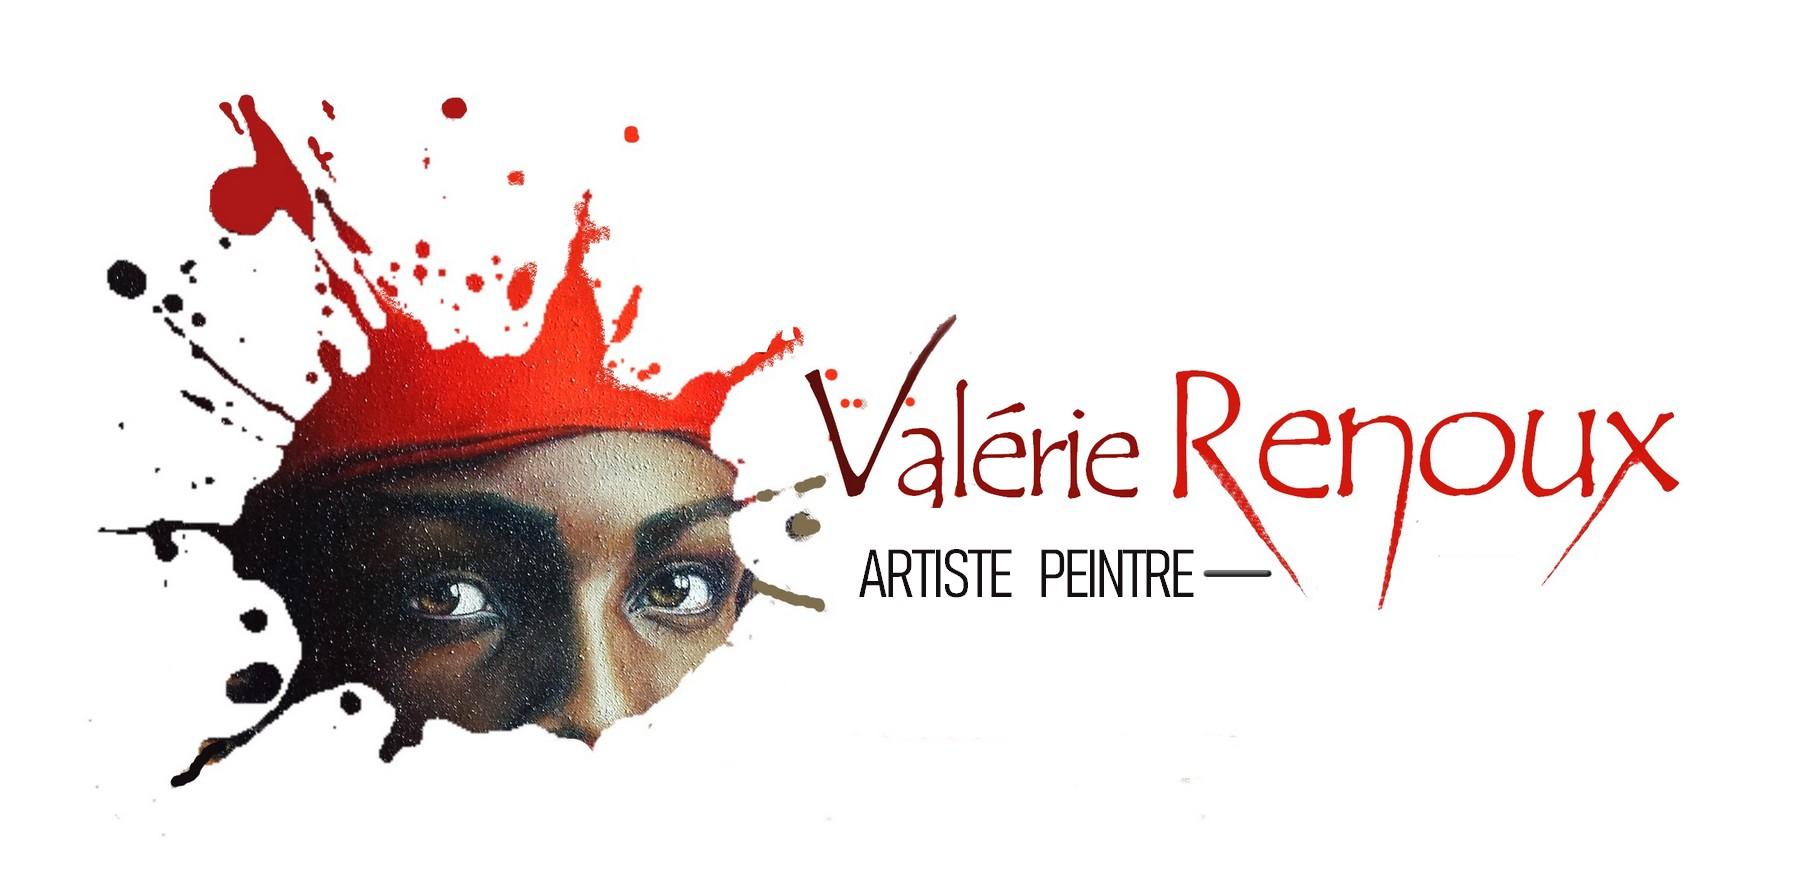 Valerie Renoux